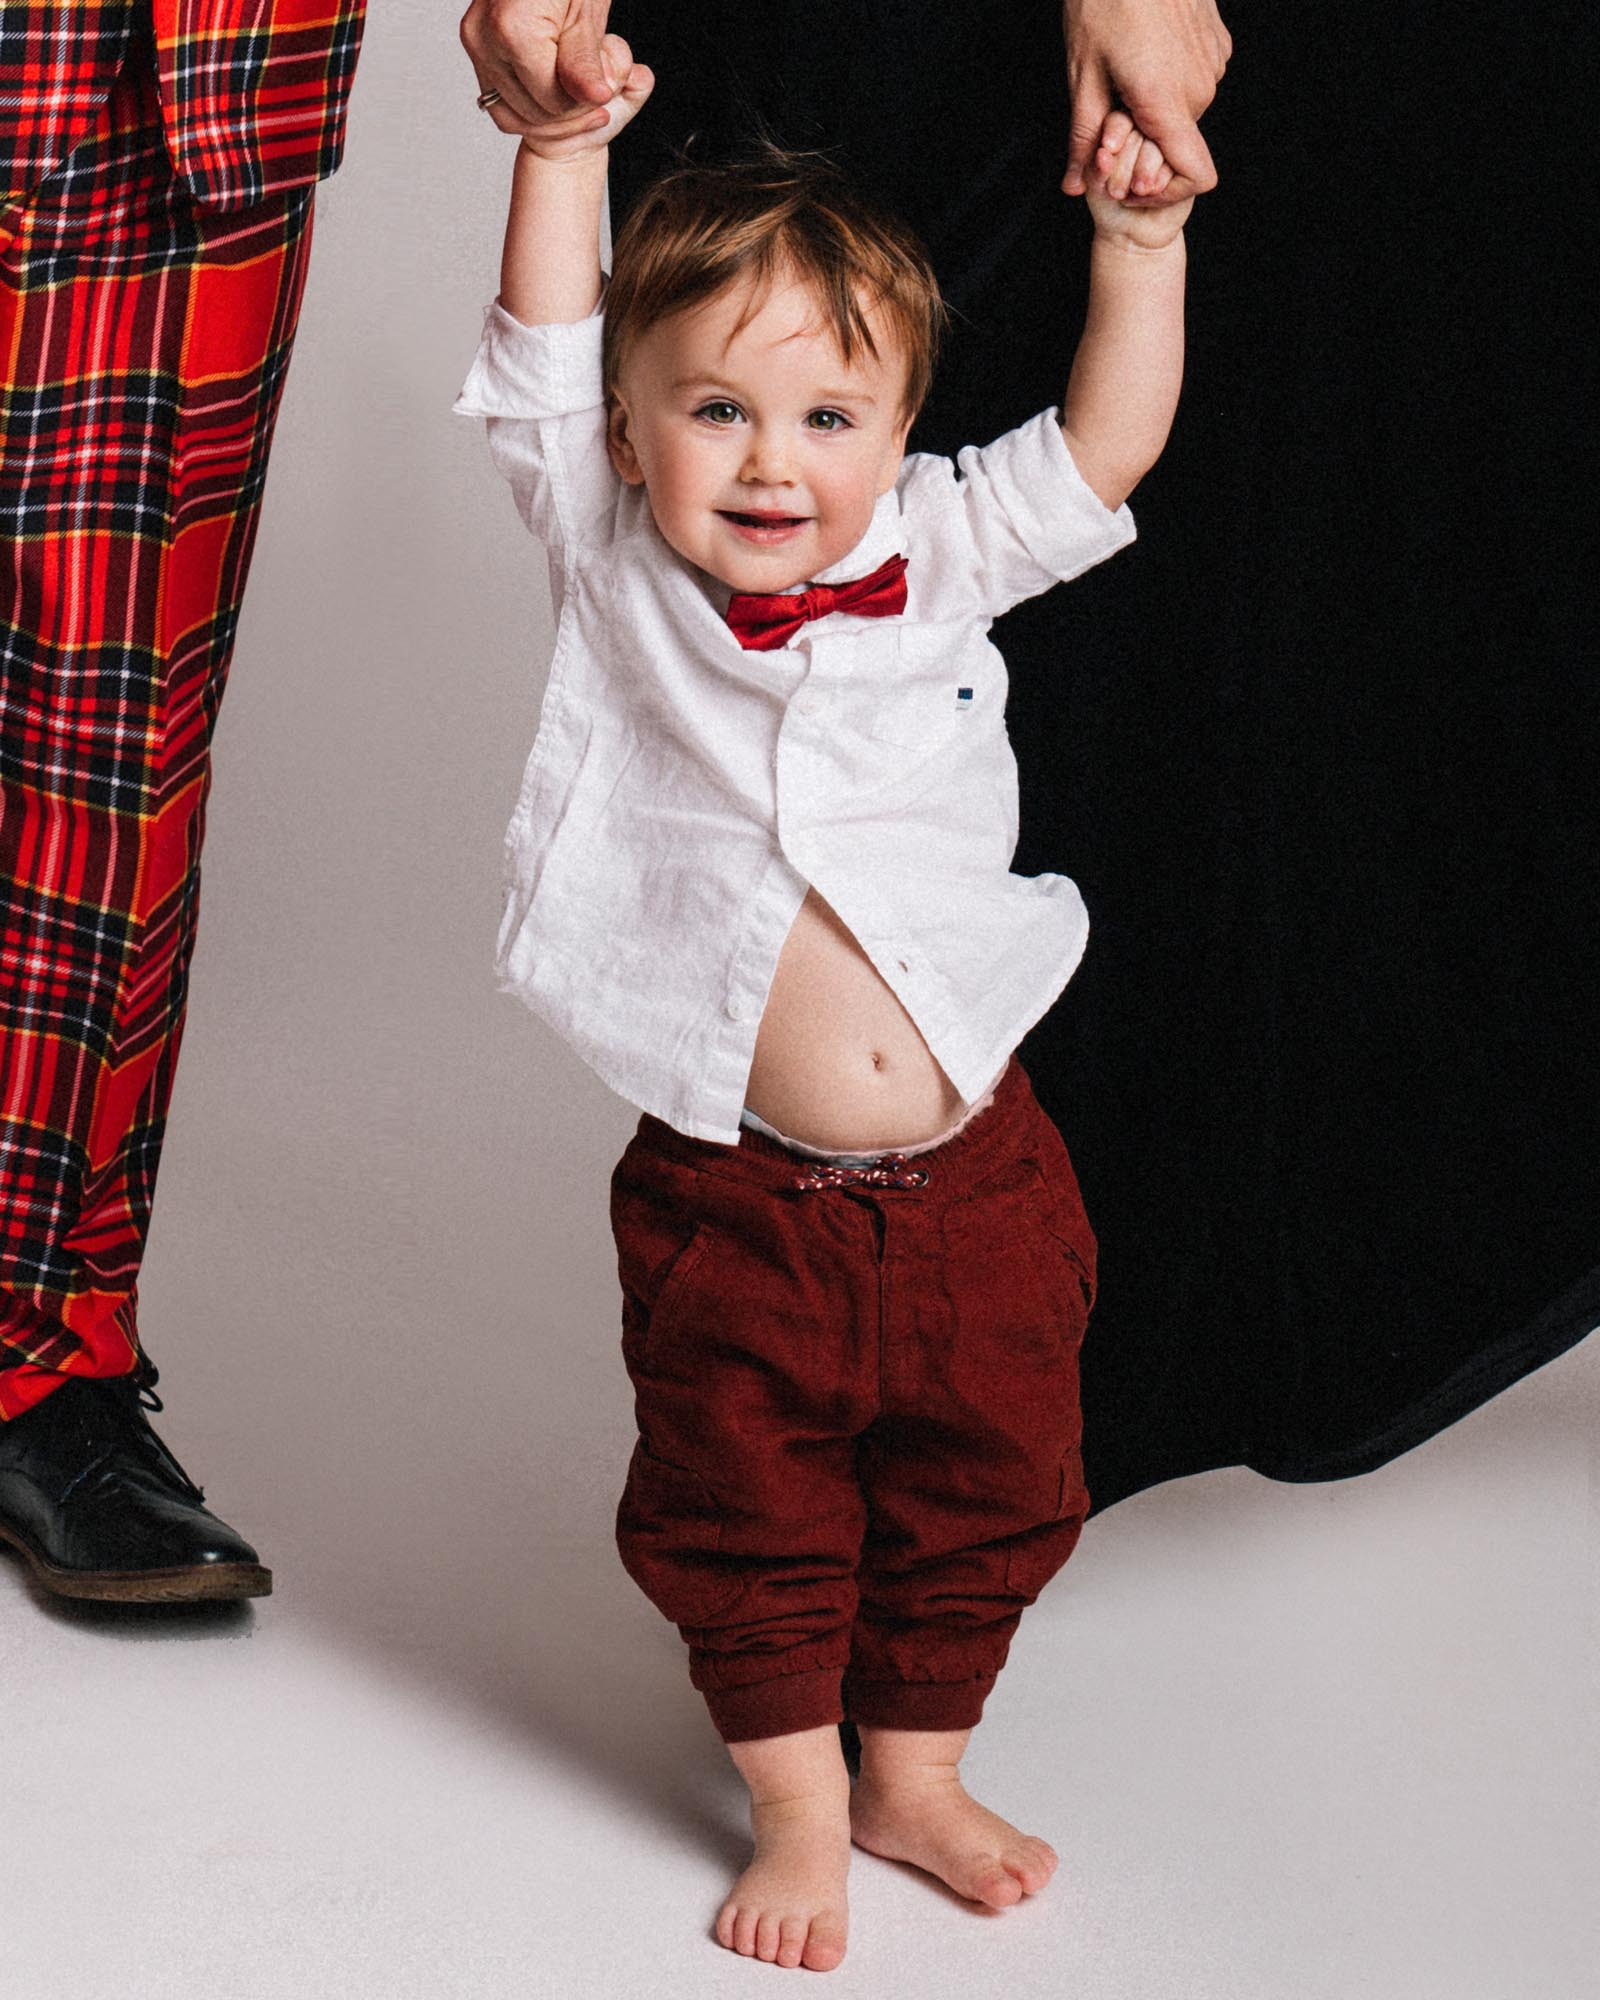 nyc-photographers-kids-modeling-10015.jpg